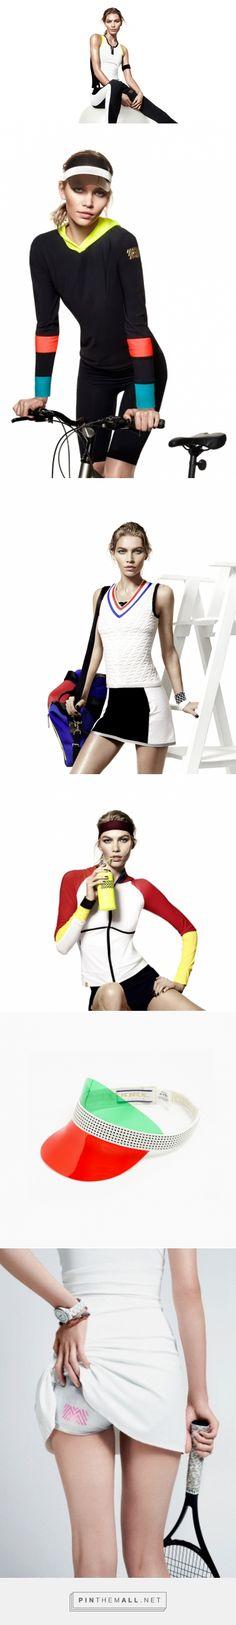 Monreal London   Luxury Sportswear For Women - created via http://pinthemall.net